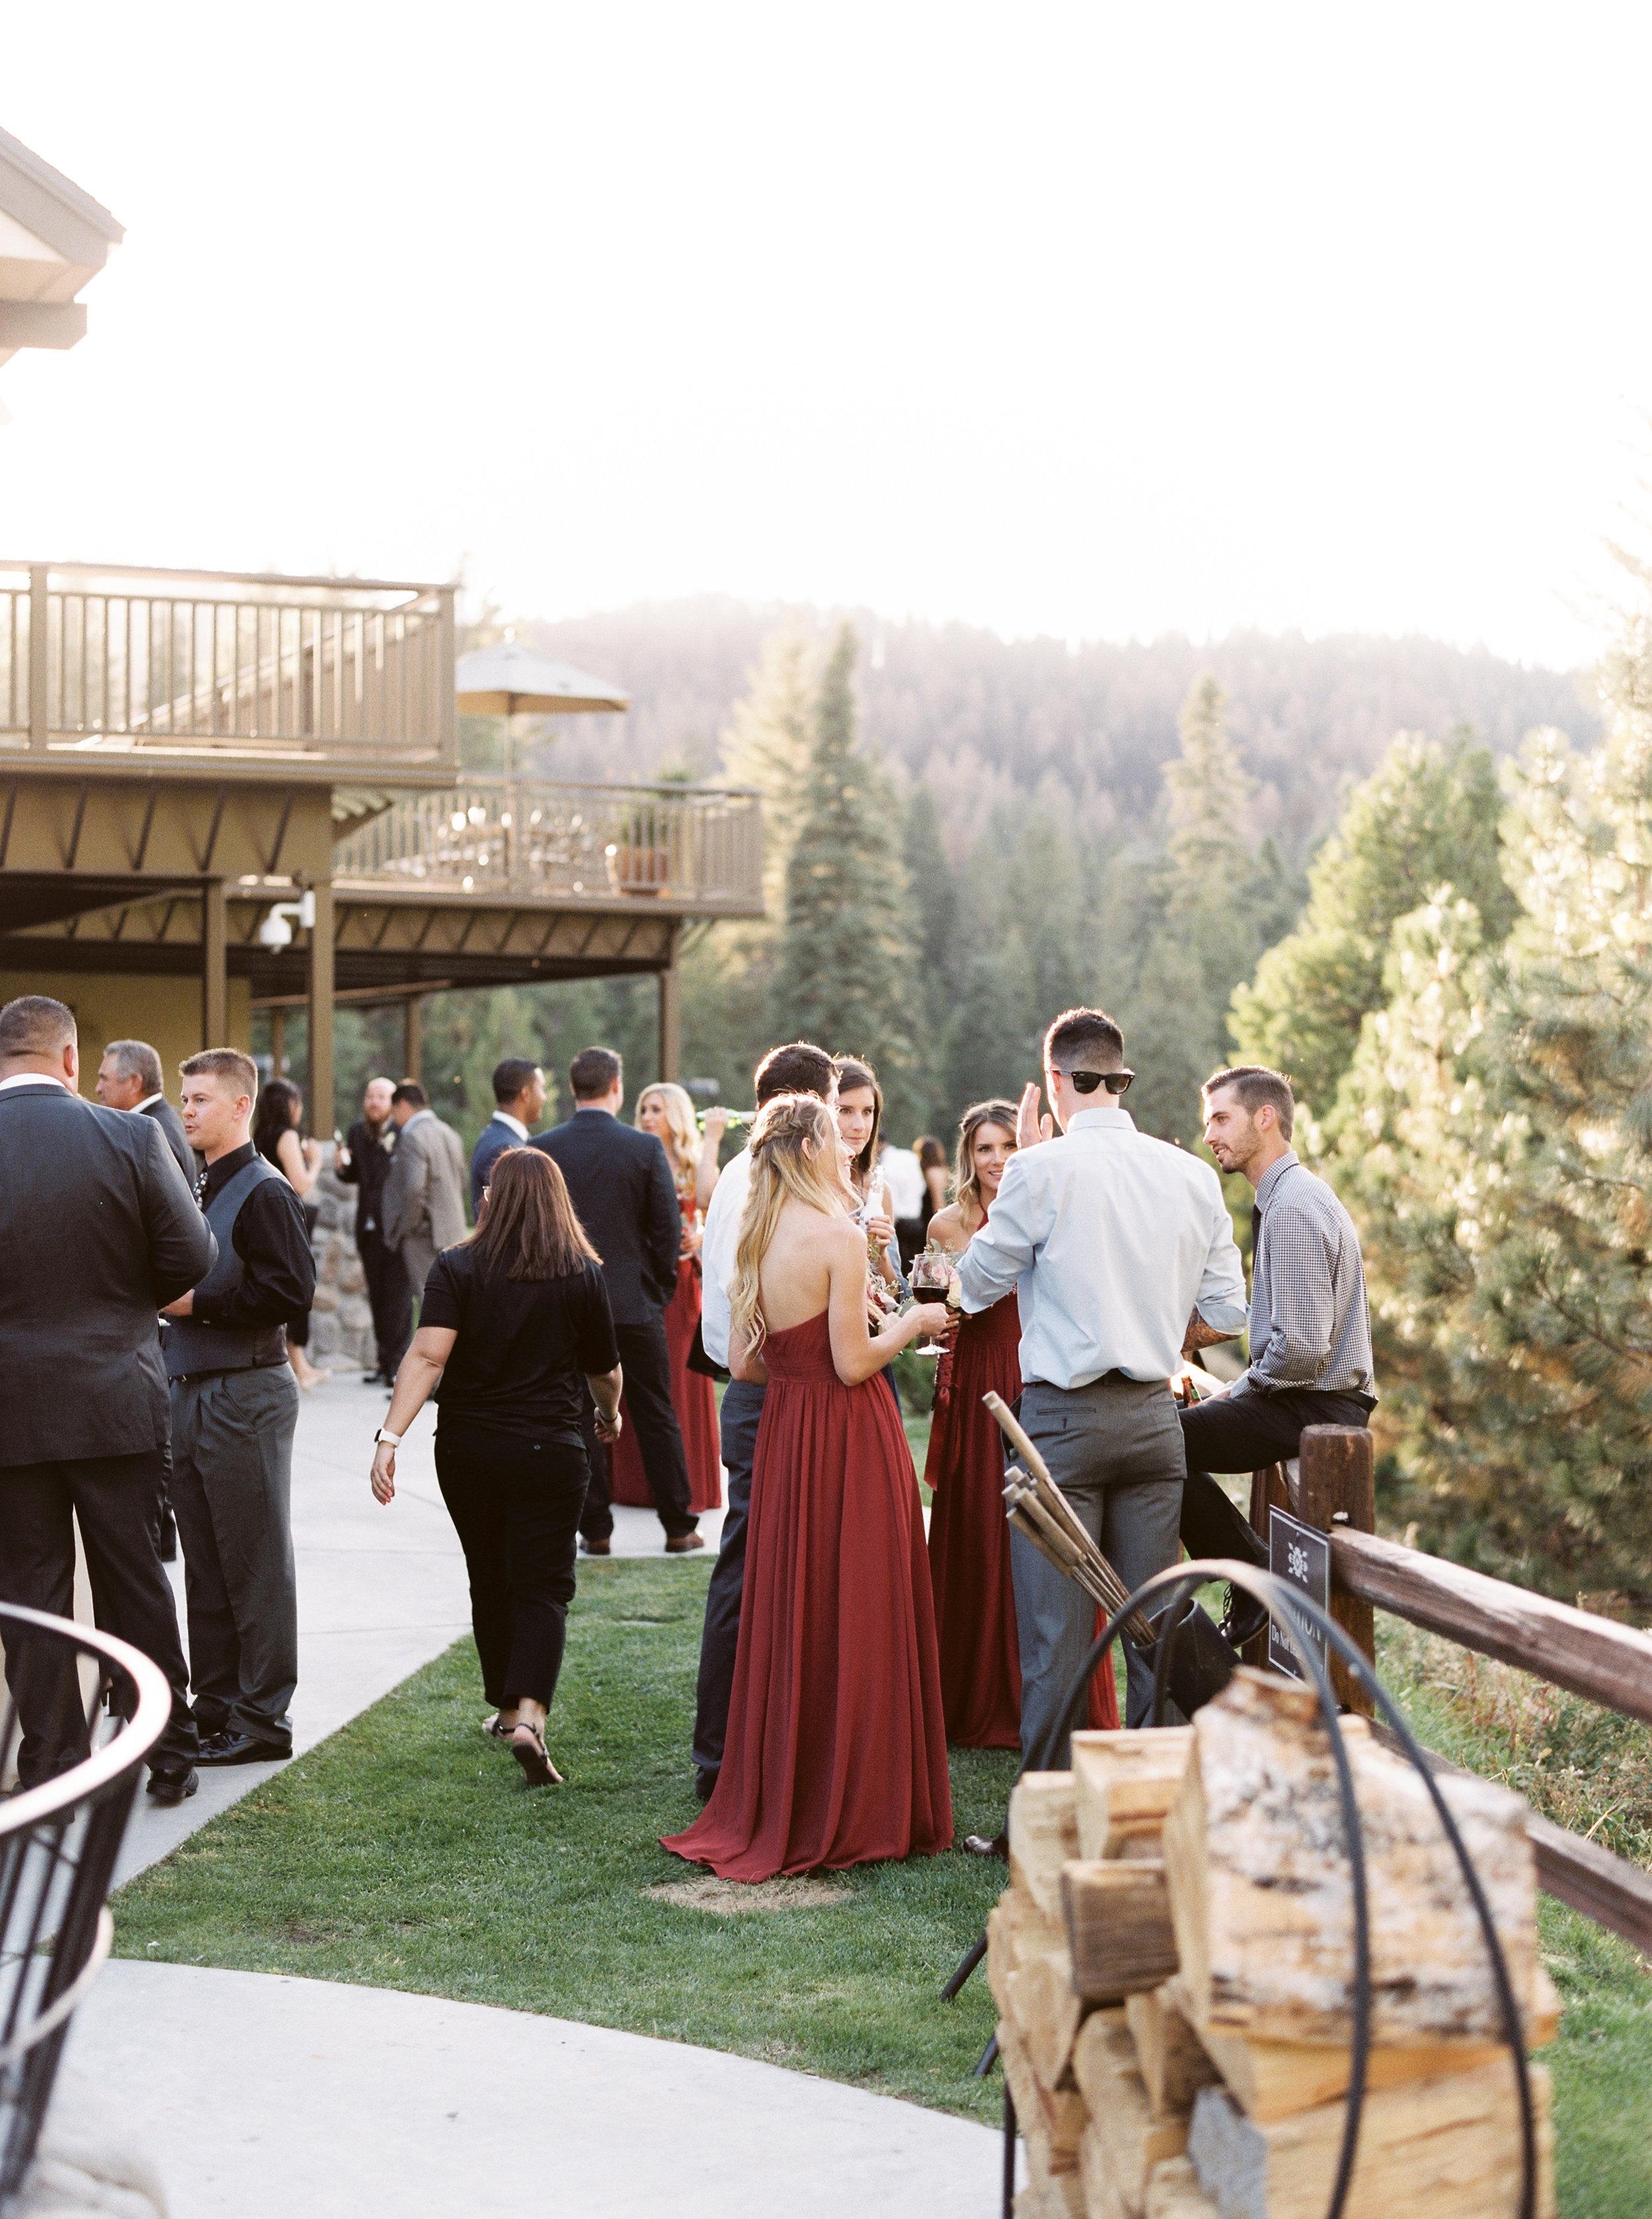 Tenaya-lodge-wedding-at-yosemite-national-park-california-50.jpg